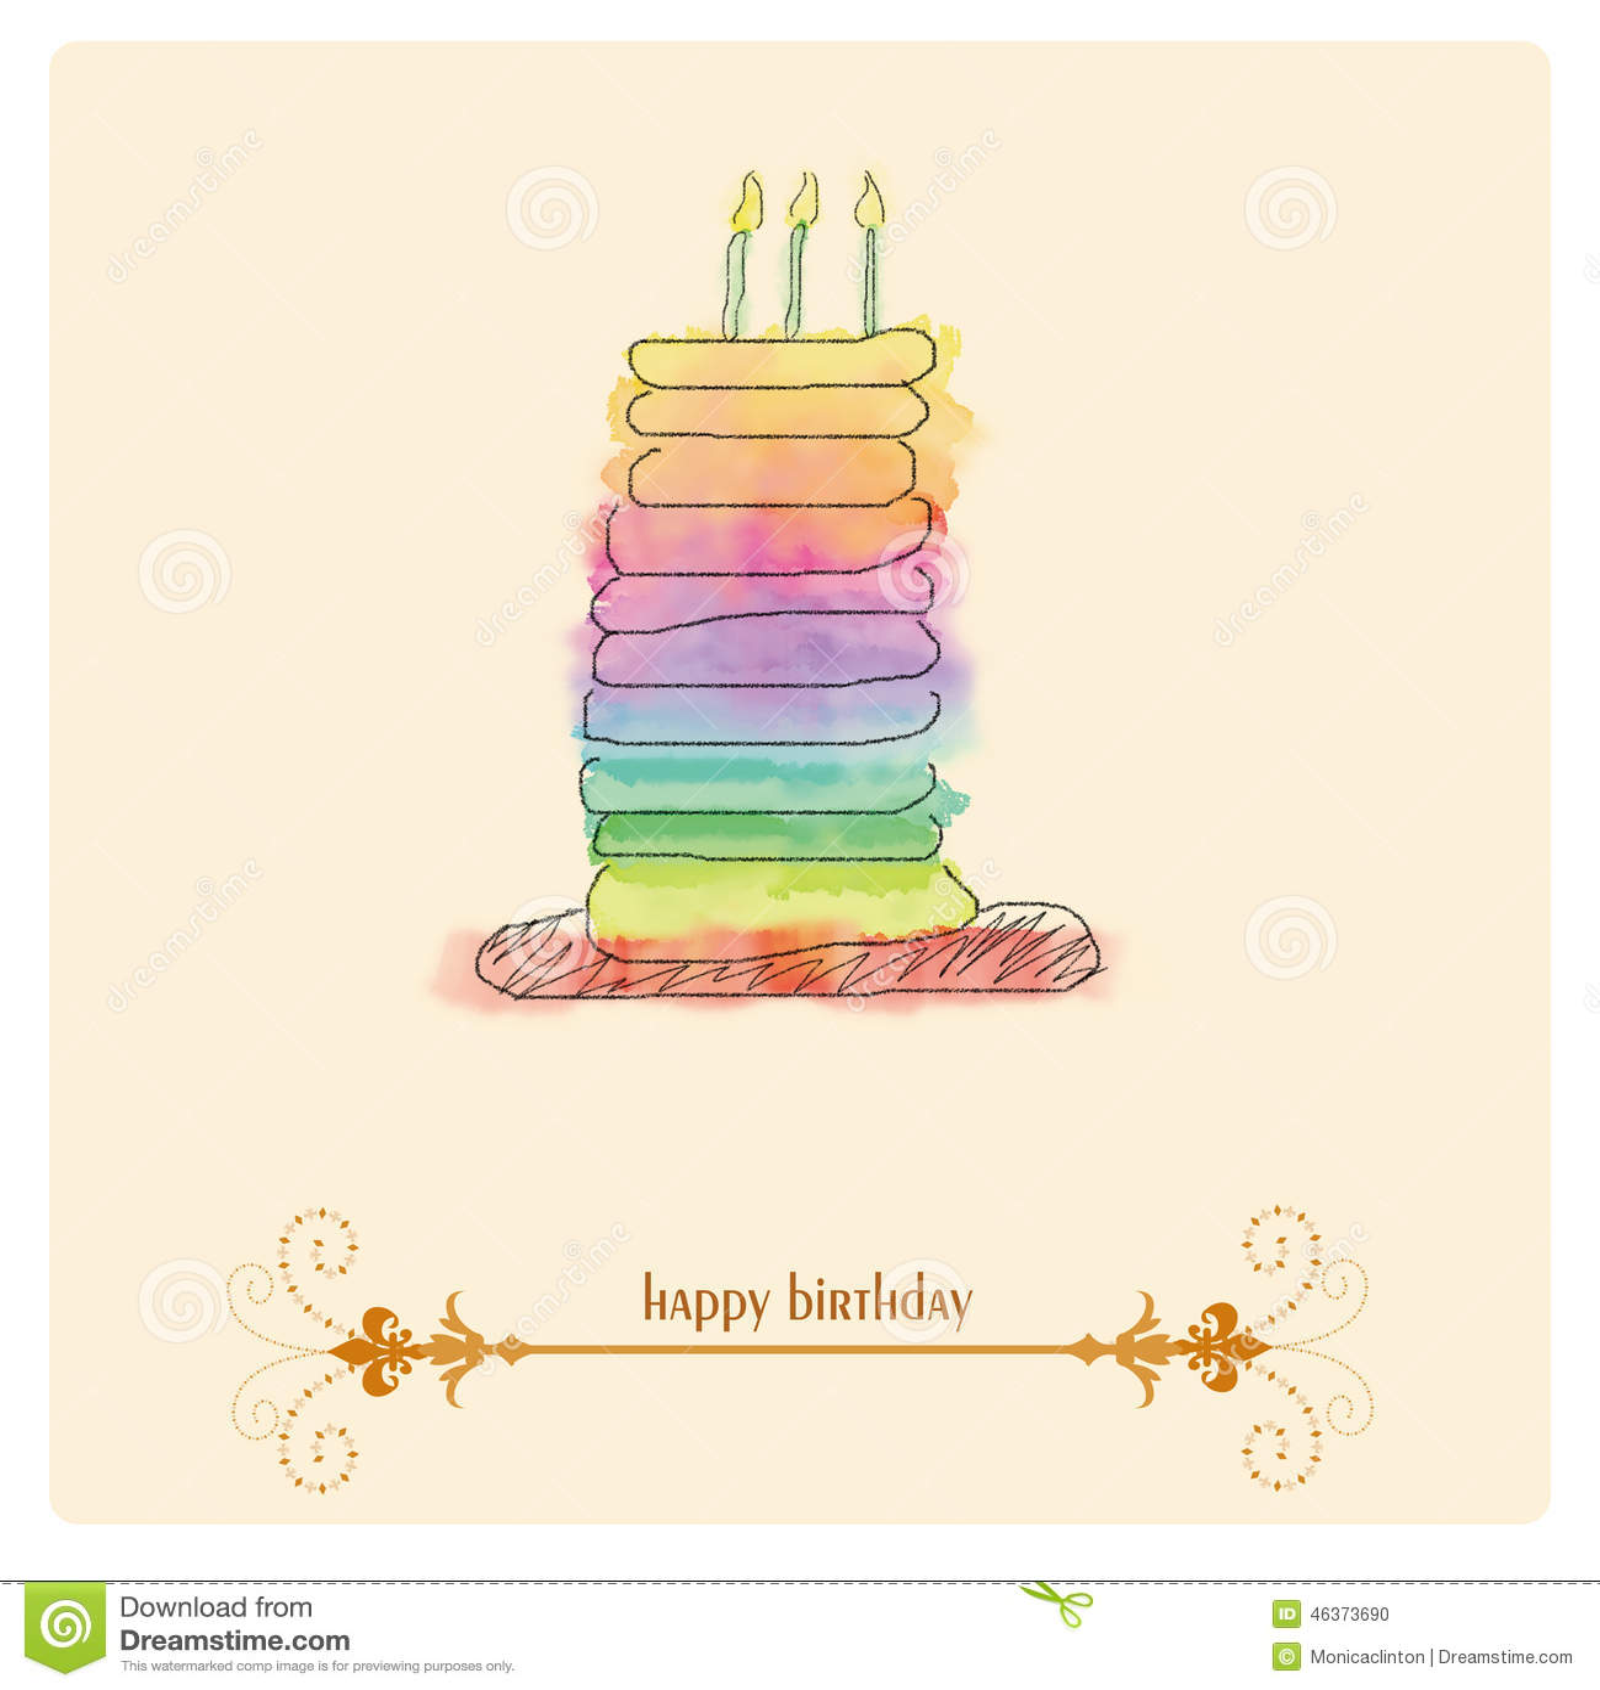 Birthday Watercolor Cake